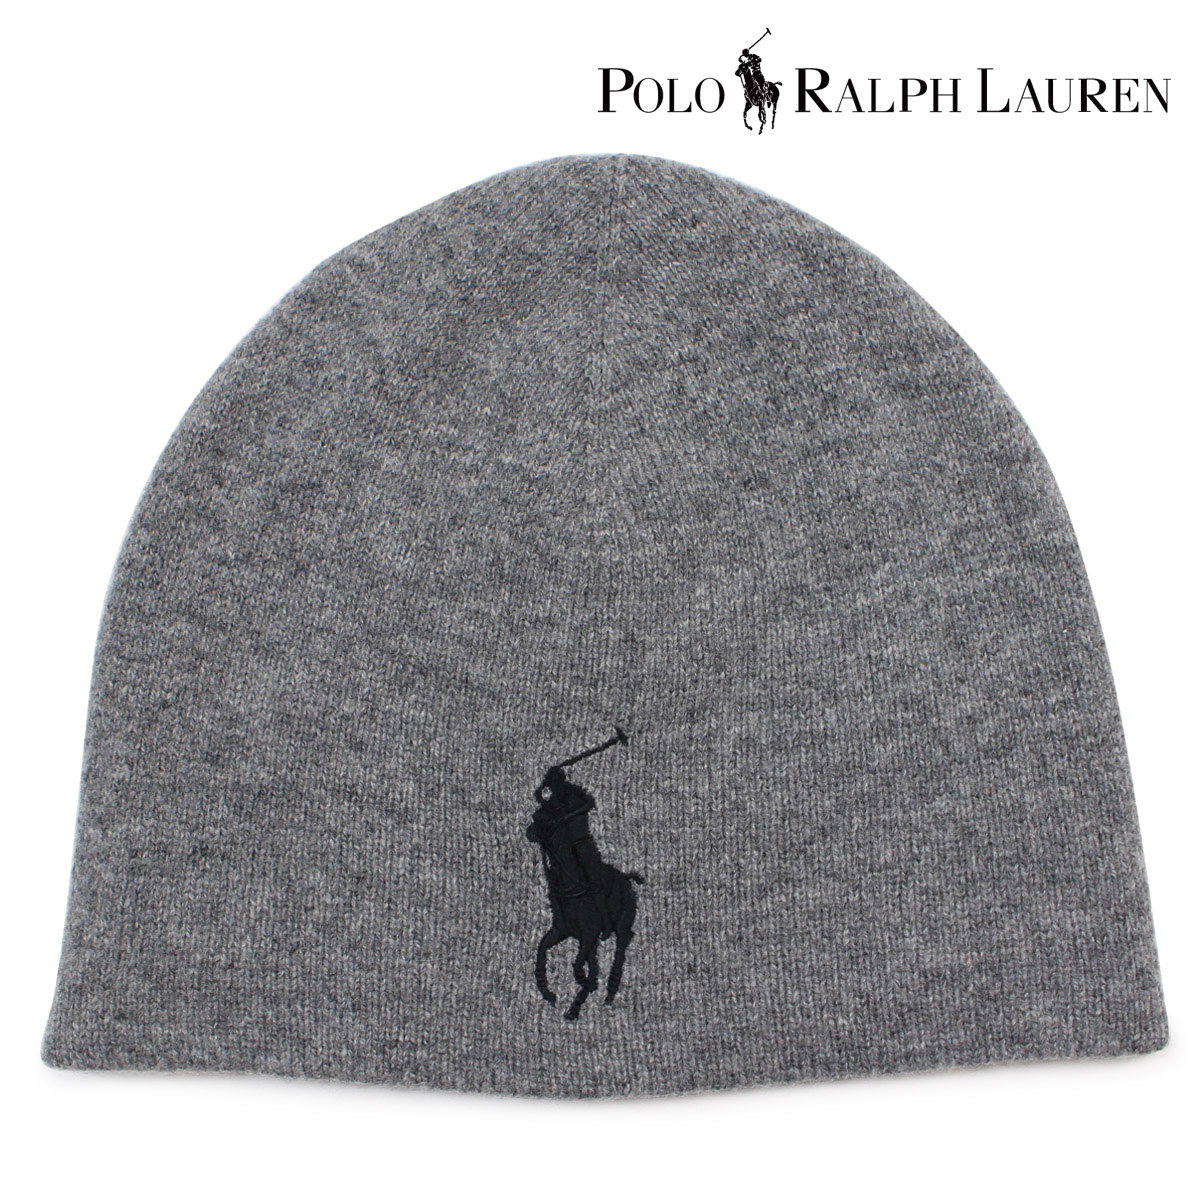 1846af84d22 ALLSPORTS  POLO RALPH LAUREN BIG PONNY WATCH CAP polo Ralph Lauren ...